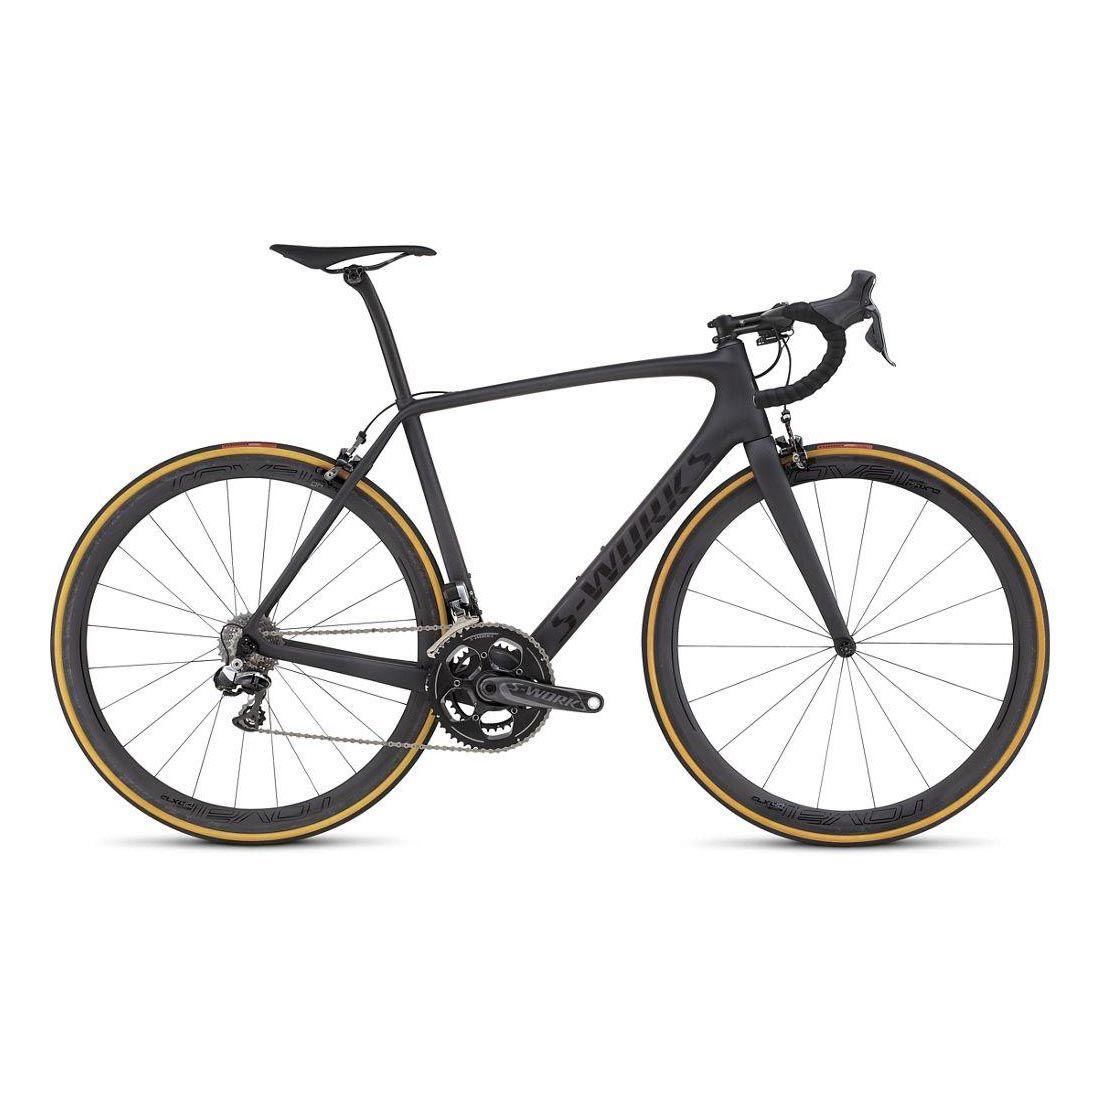 New Bike Day Canyon Aeroad Cf Sl 8 0 Di2 Canyon Canyonaeroad